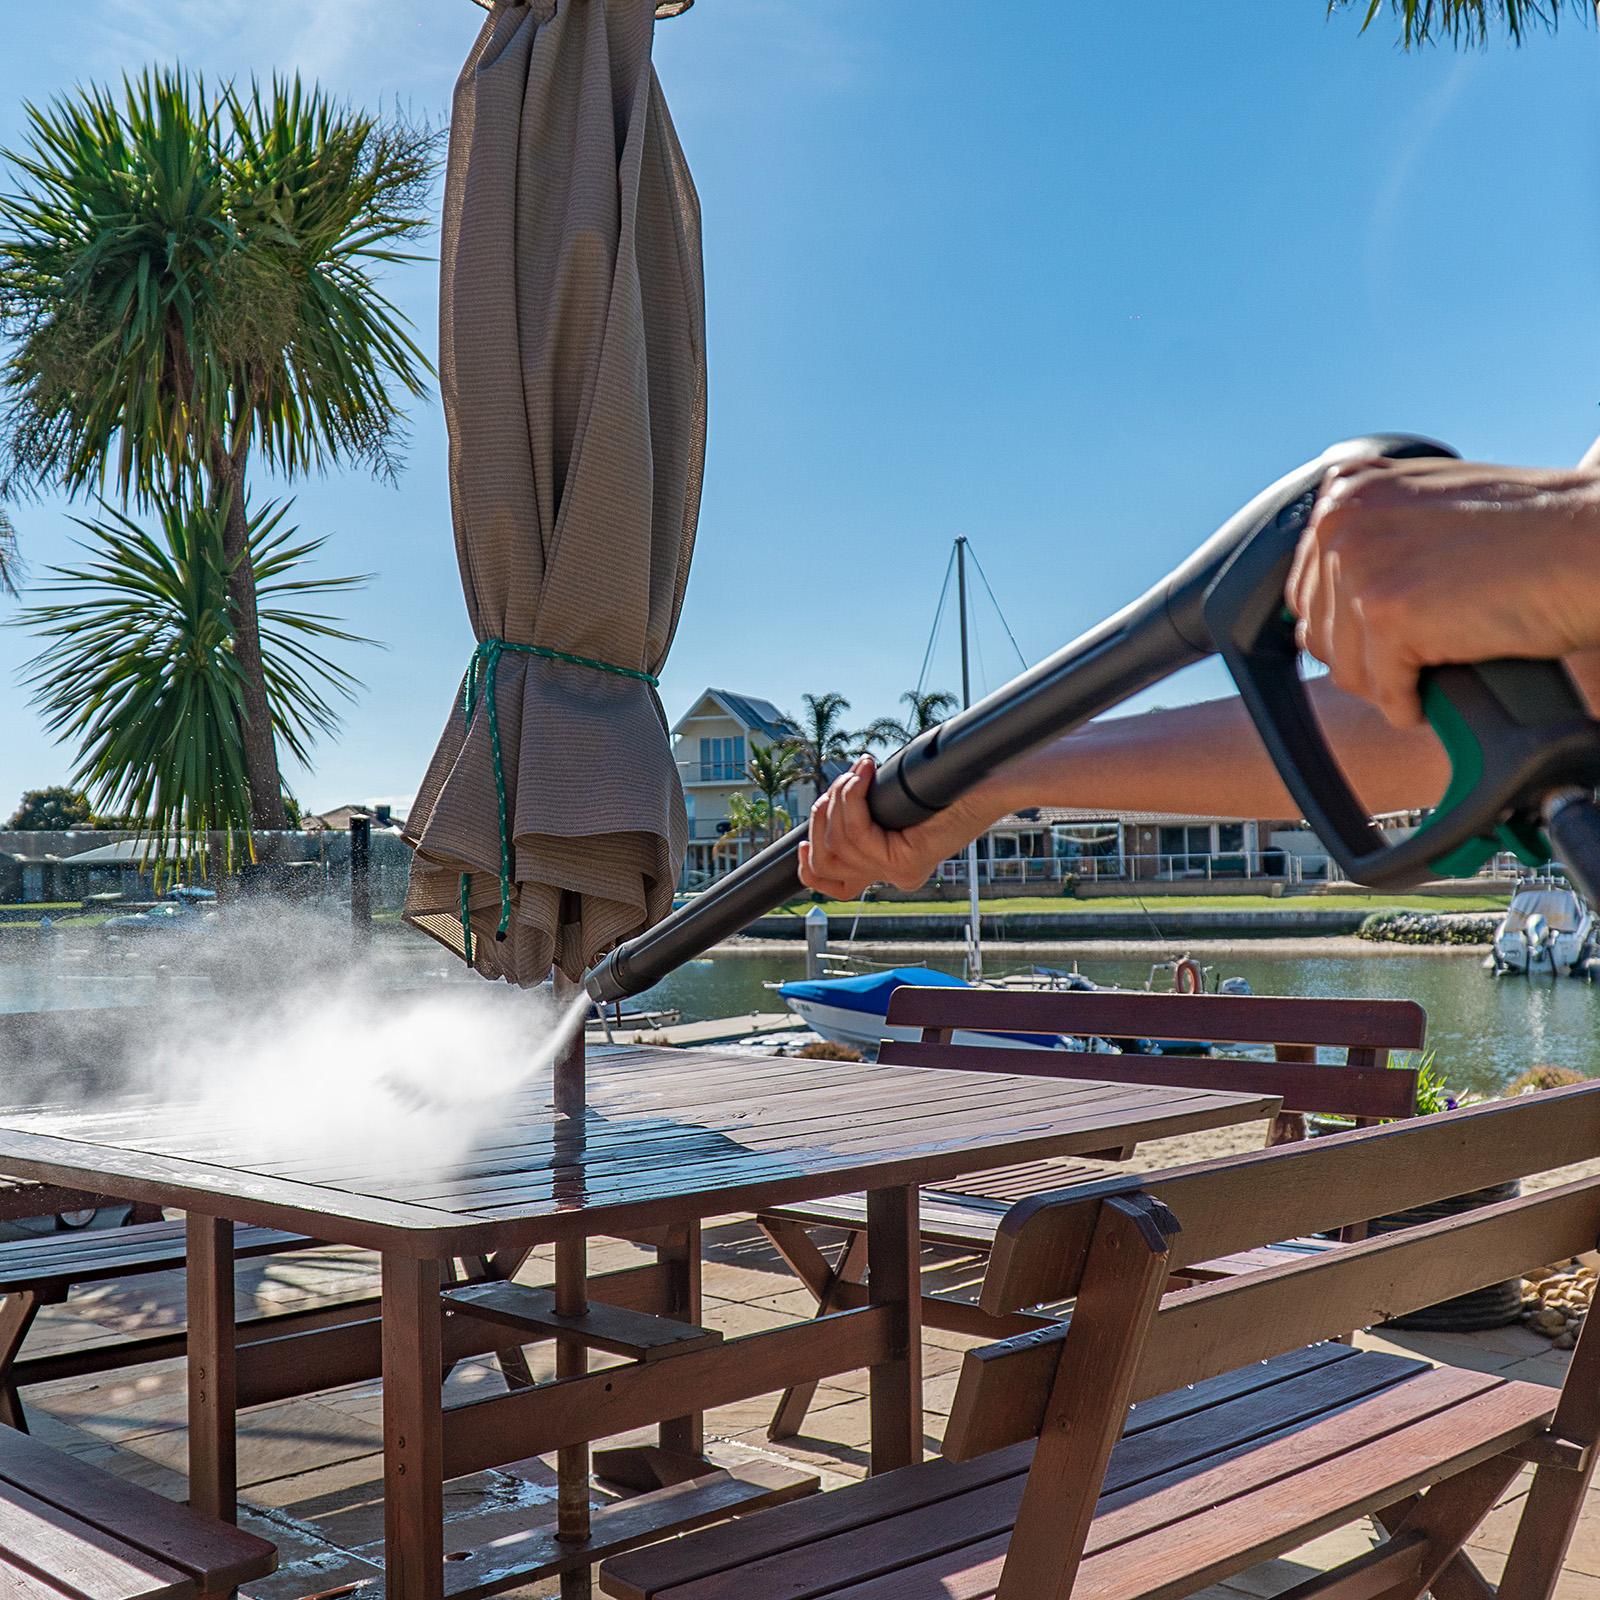 Gerni G4 Spray Handle Lance - Outdoor Table Seating